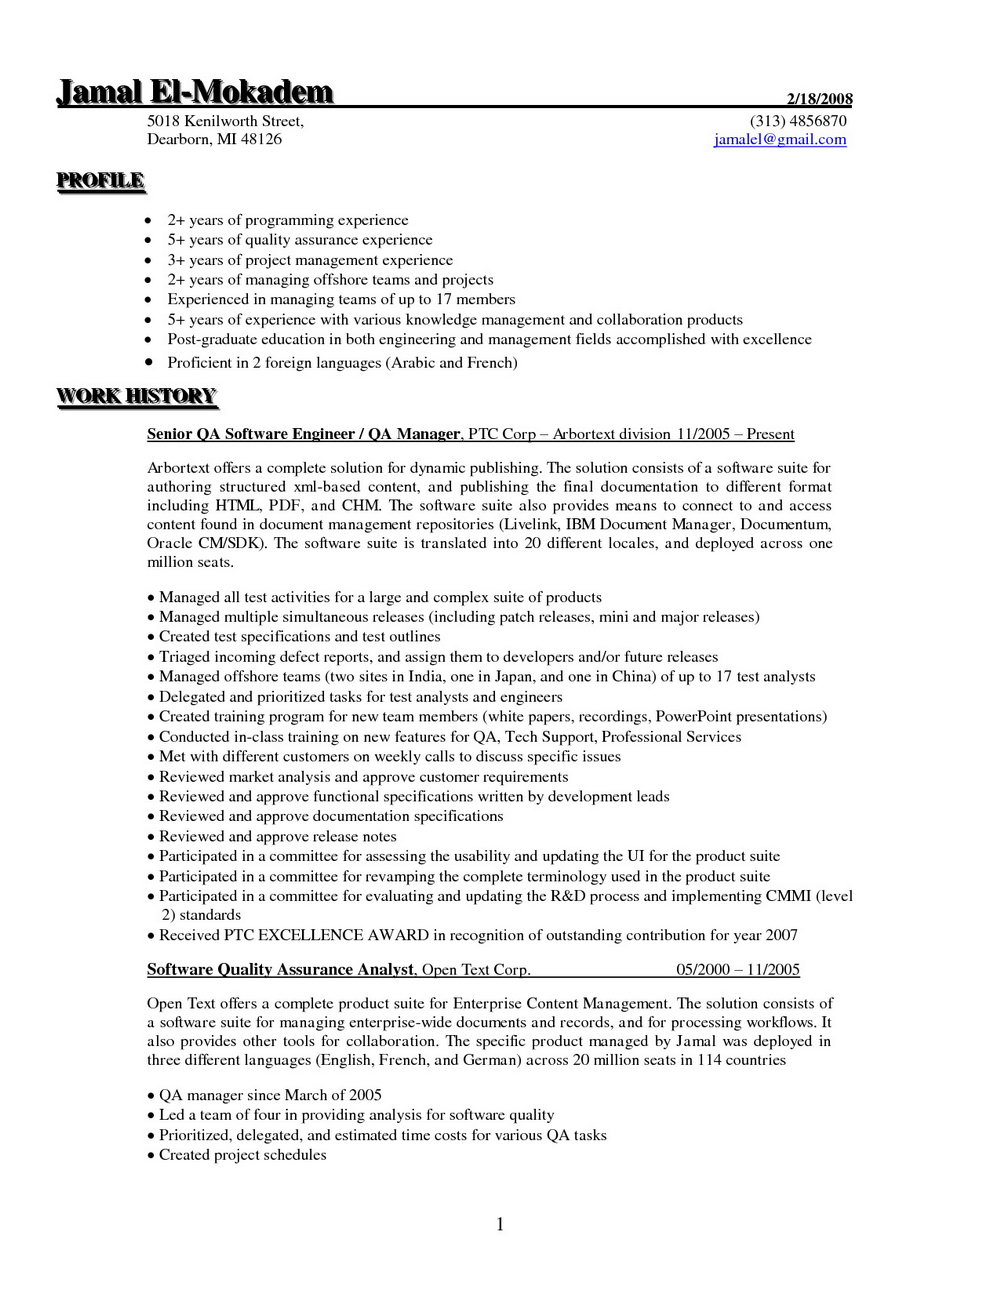 Quality Assurance Lead Resume